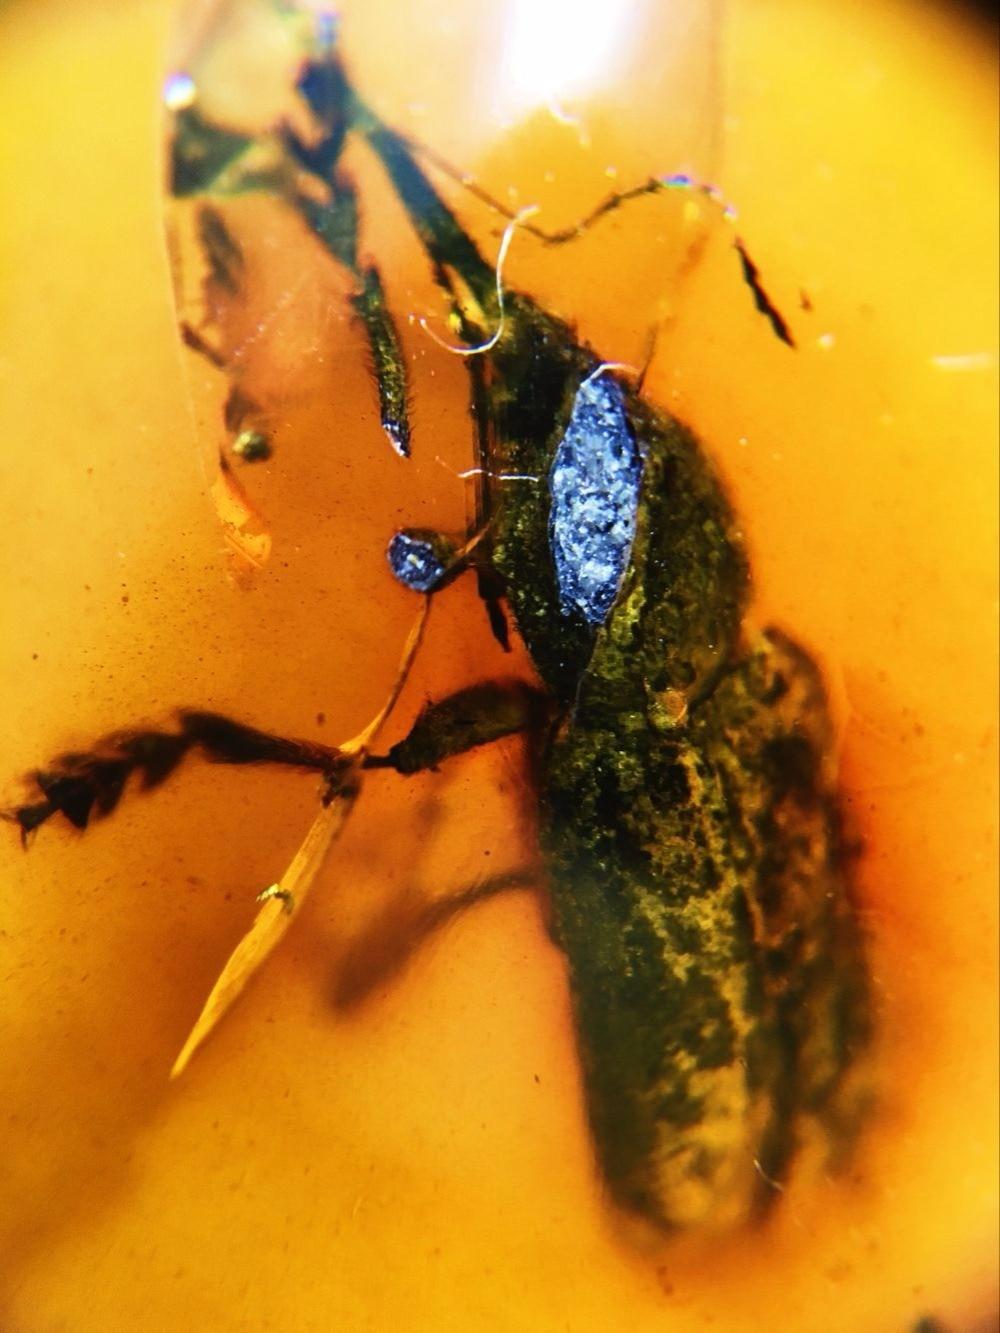 (15mm) curculionidae weevil long trunk beetle untreated burmite Myanmar Burma Amber insect lynx stone dinosaurs age Cretaceous rare fbig 12mm unknown insect untreated burmite myanmar burma amber insect lynx stone dinosaurs age cretaceous